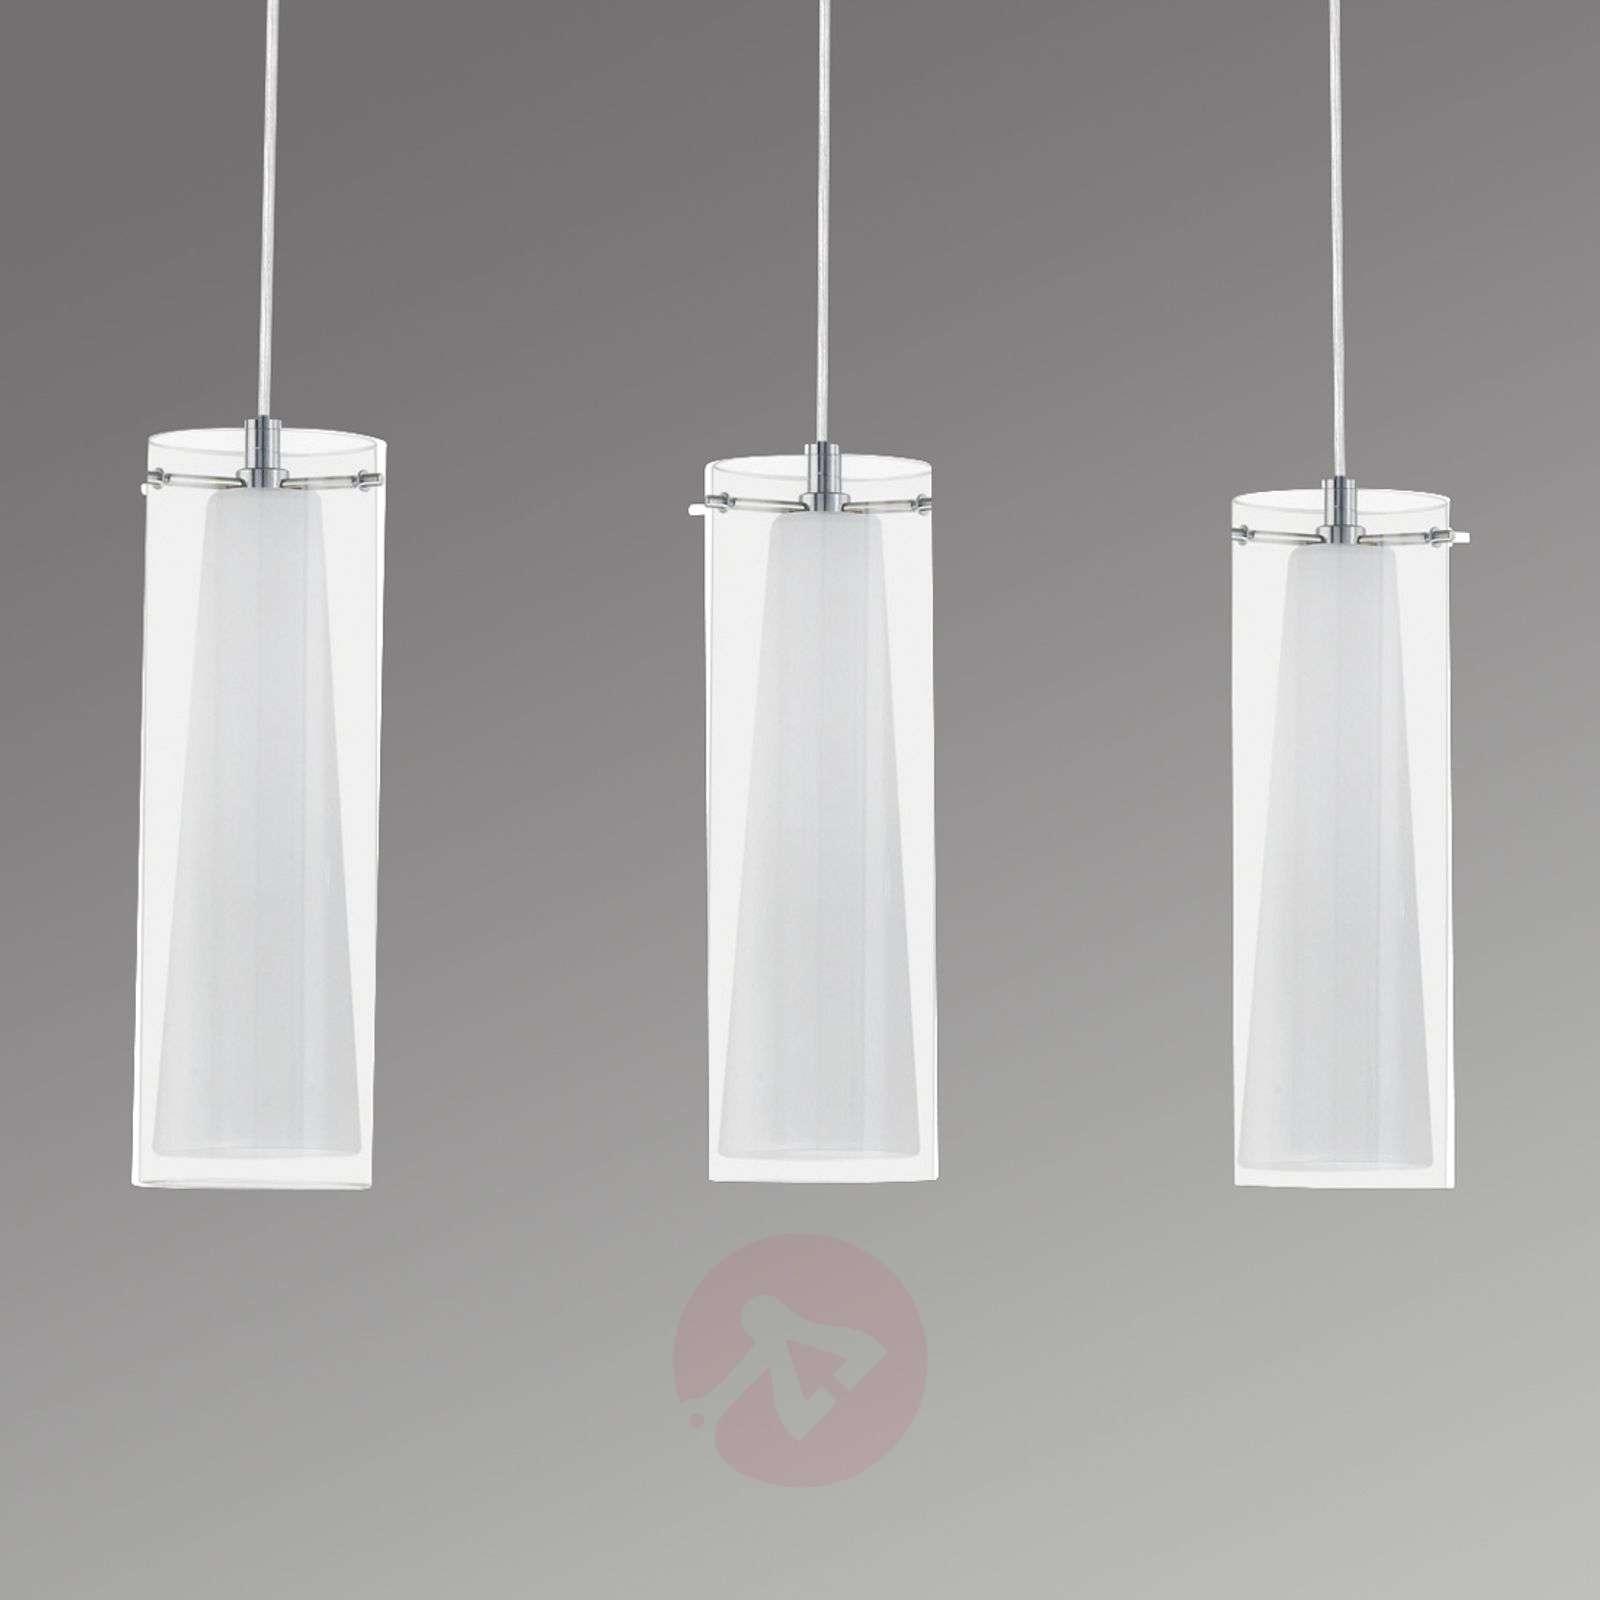 PINTO Impressive Pendant Lamp, 3 Lamp-3031414-01